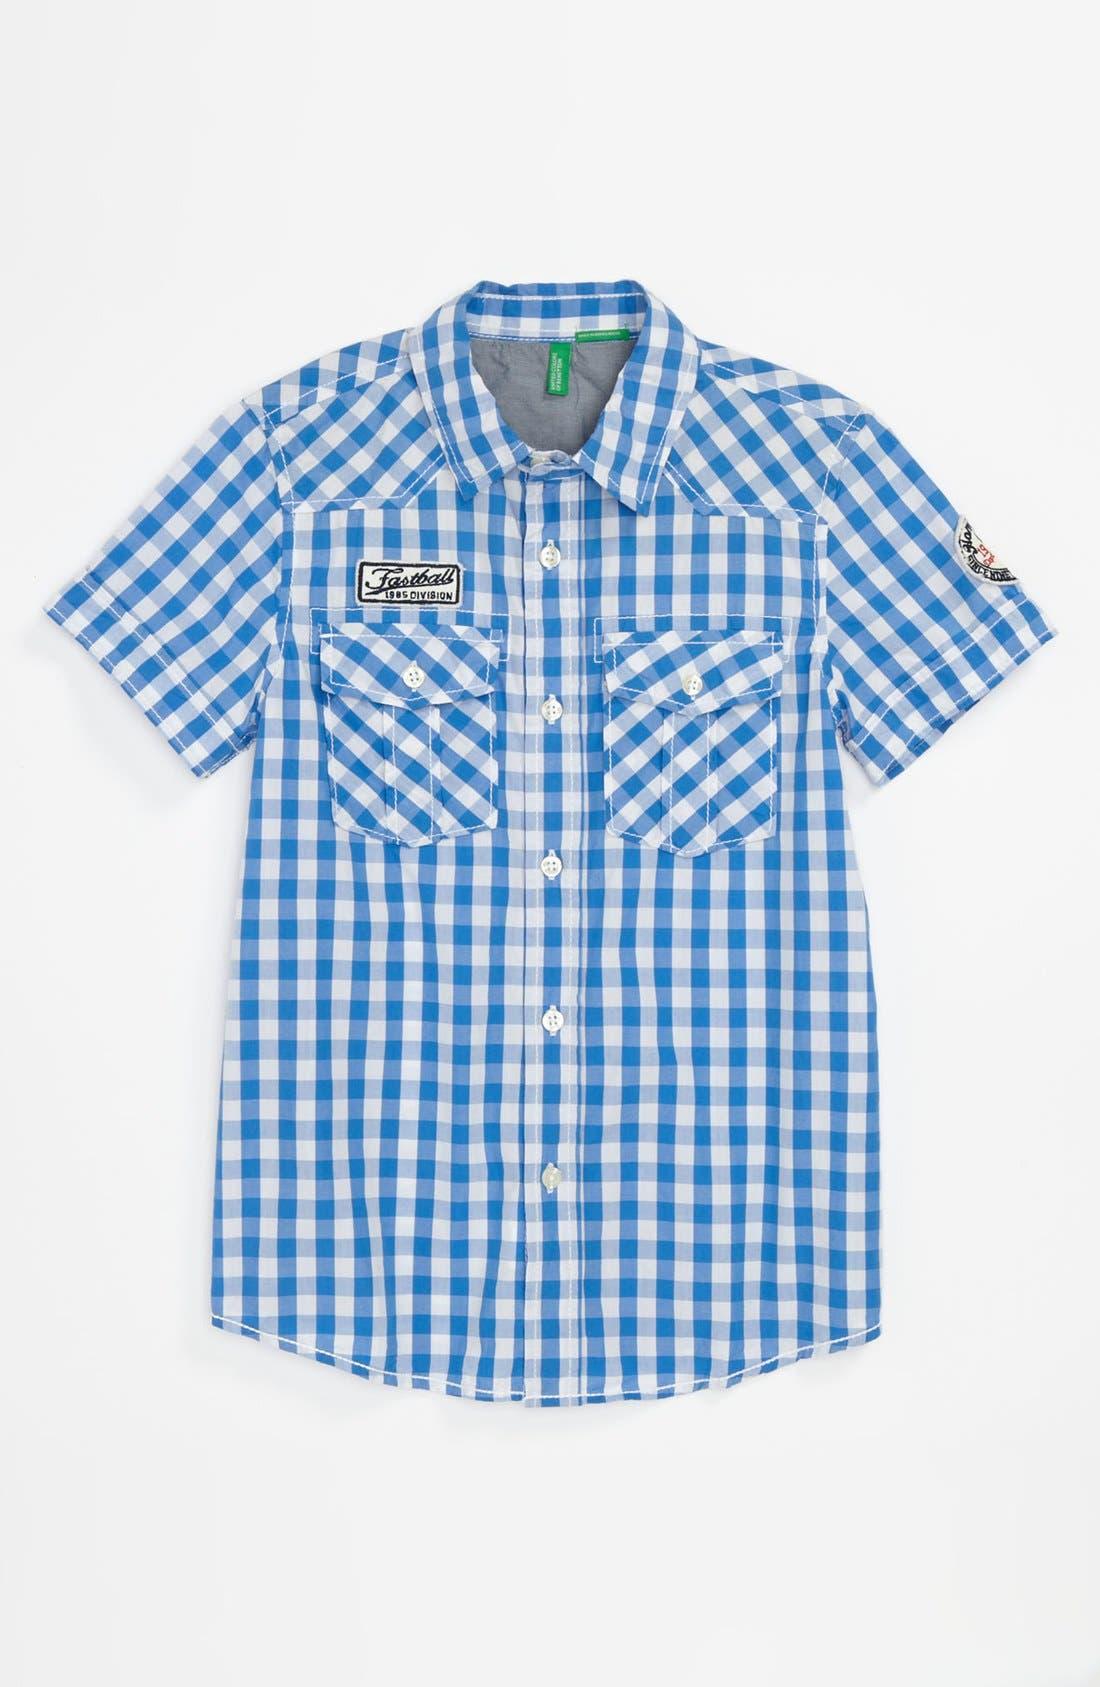 Main Image - United Colors of Benetton Kids Gingham Shirt (Big Boys)